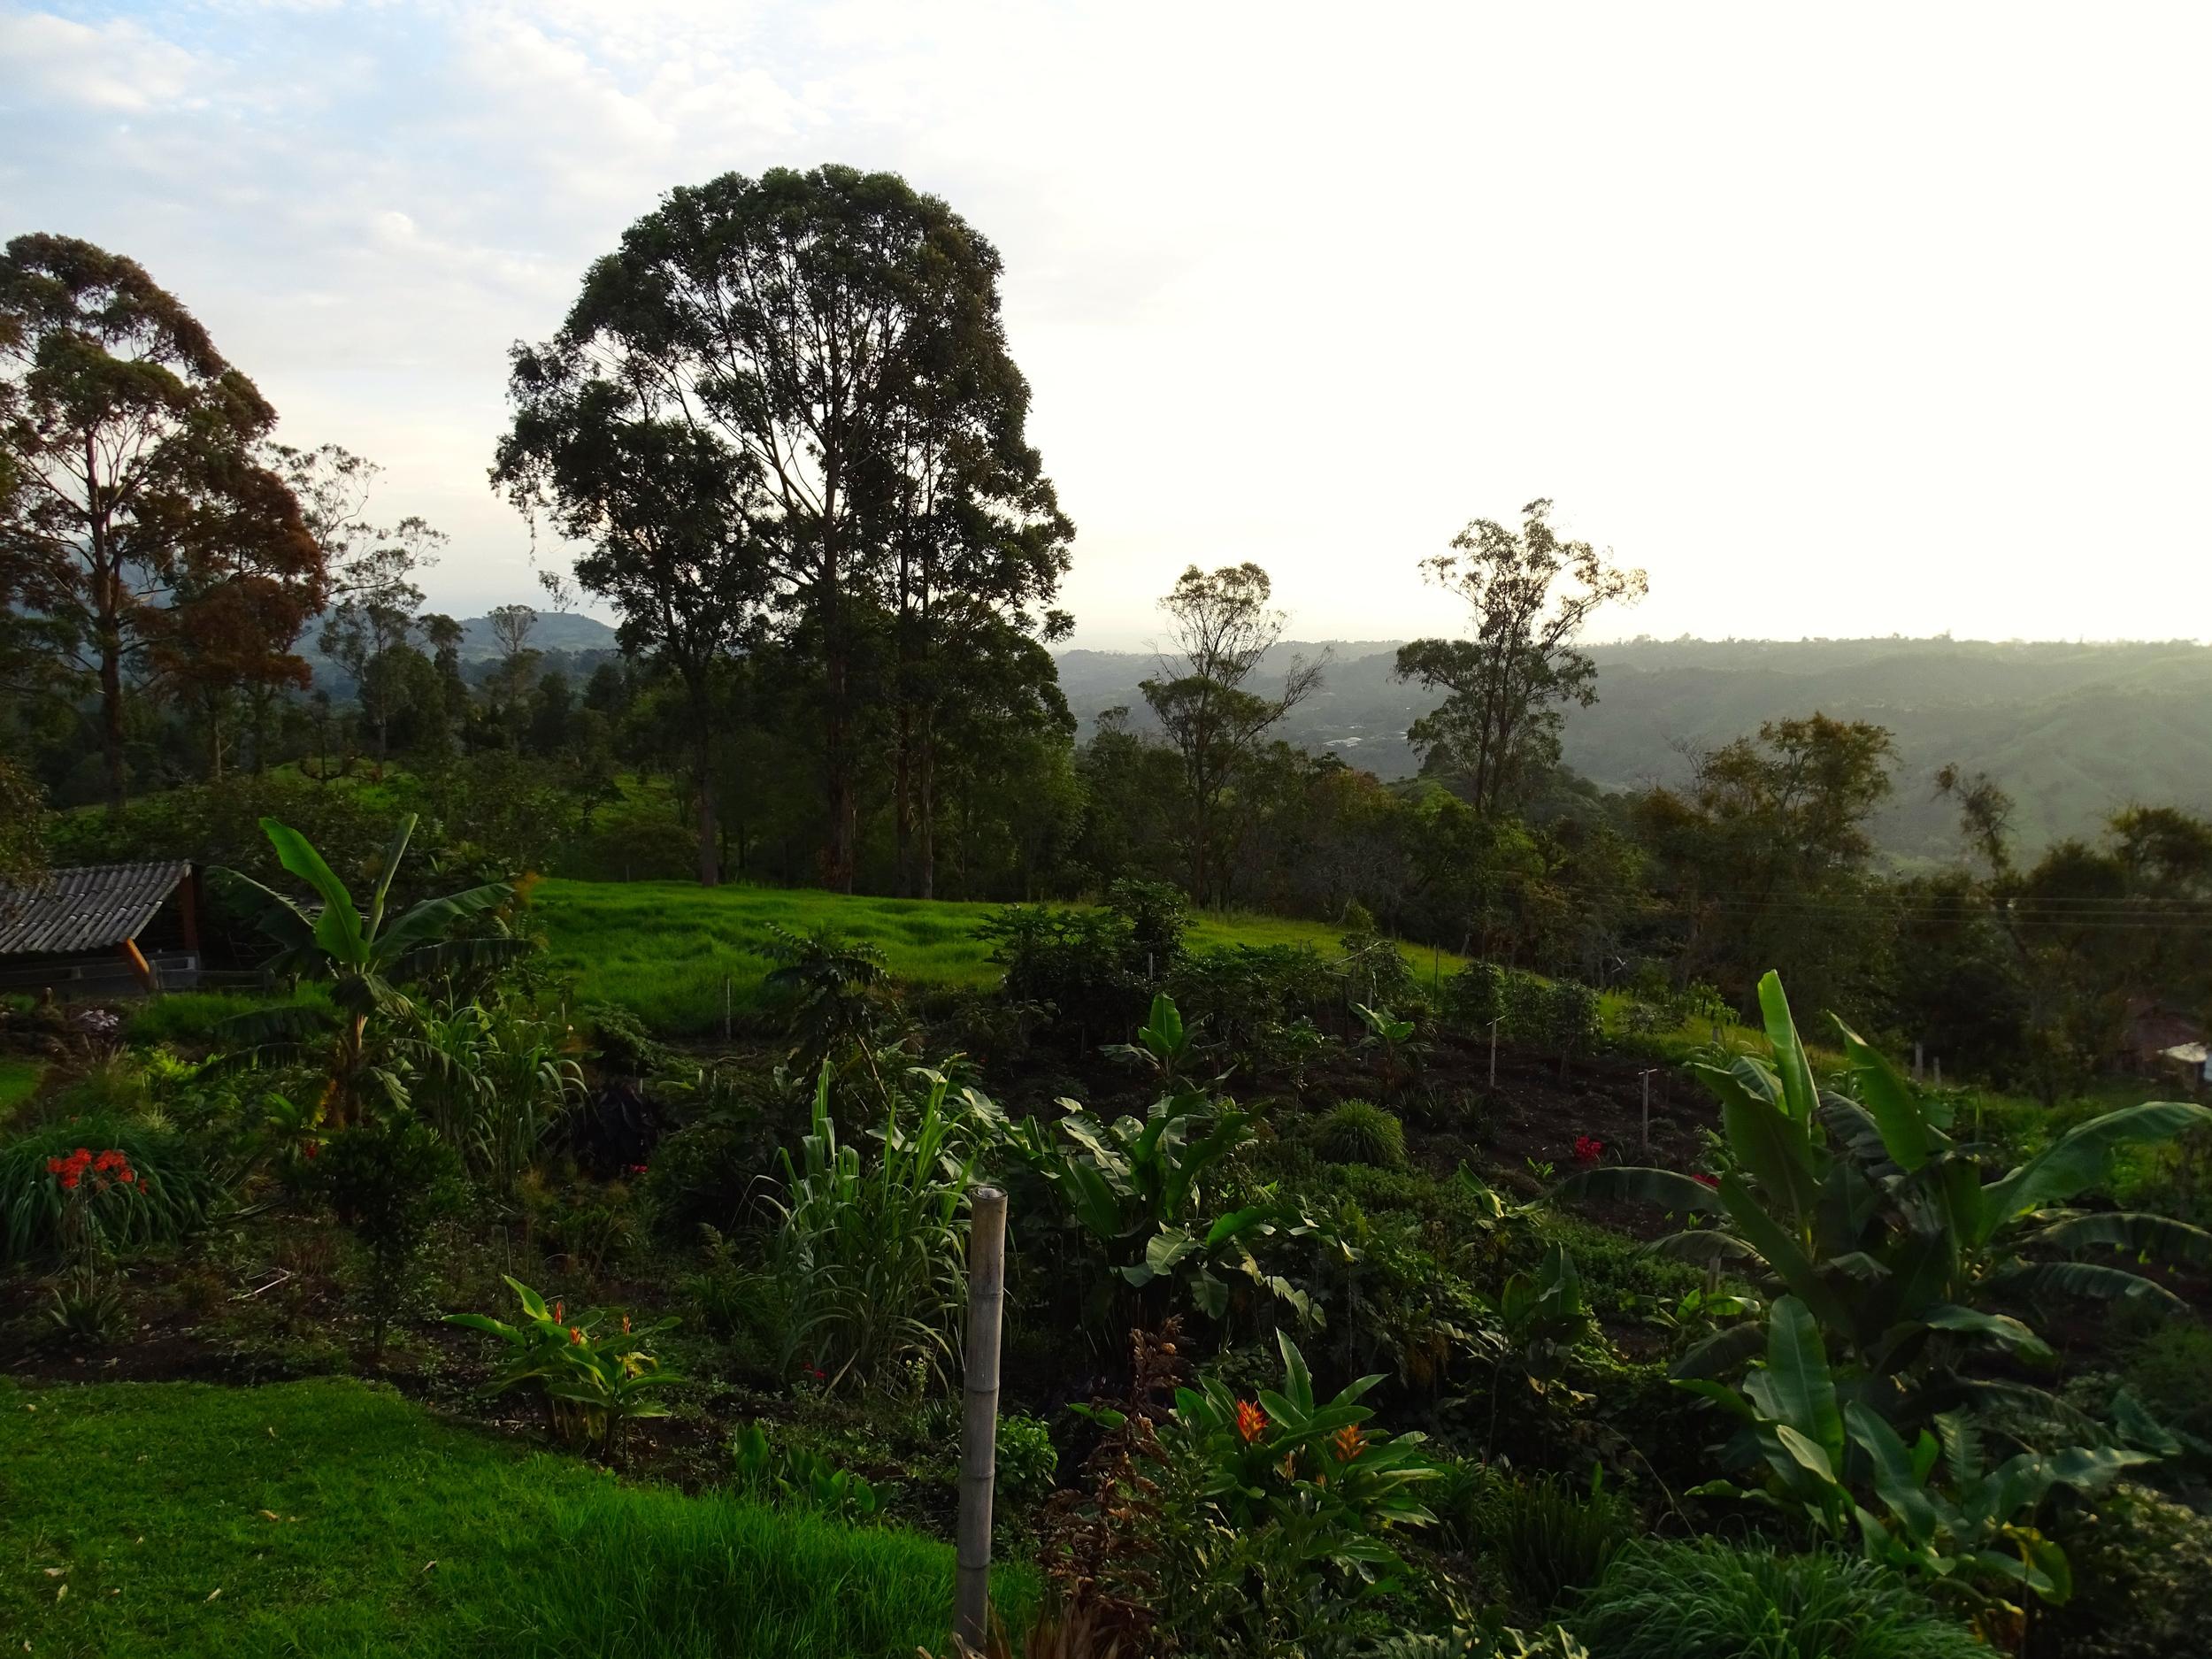 The next couple photos are the views around the hostel.